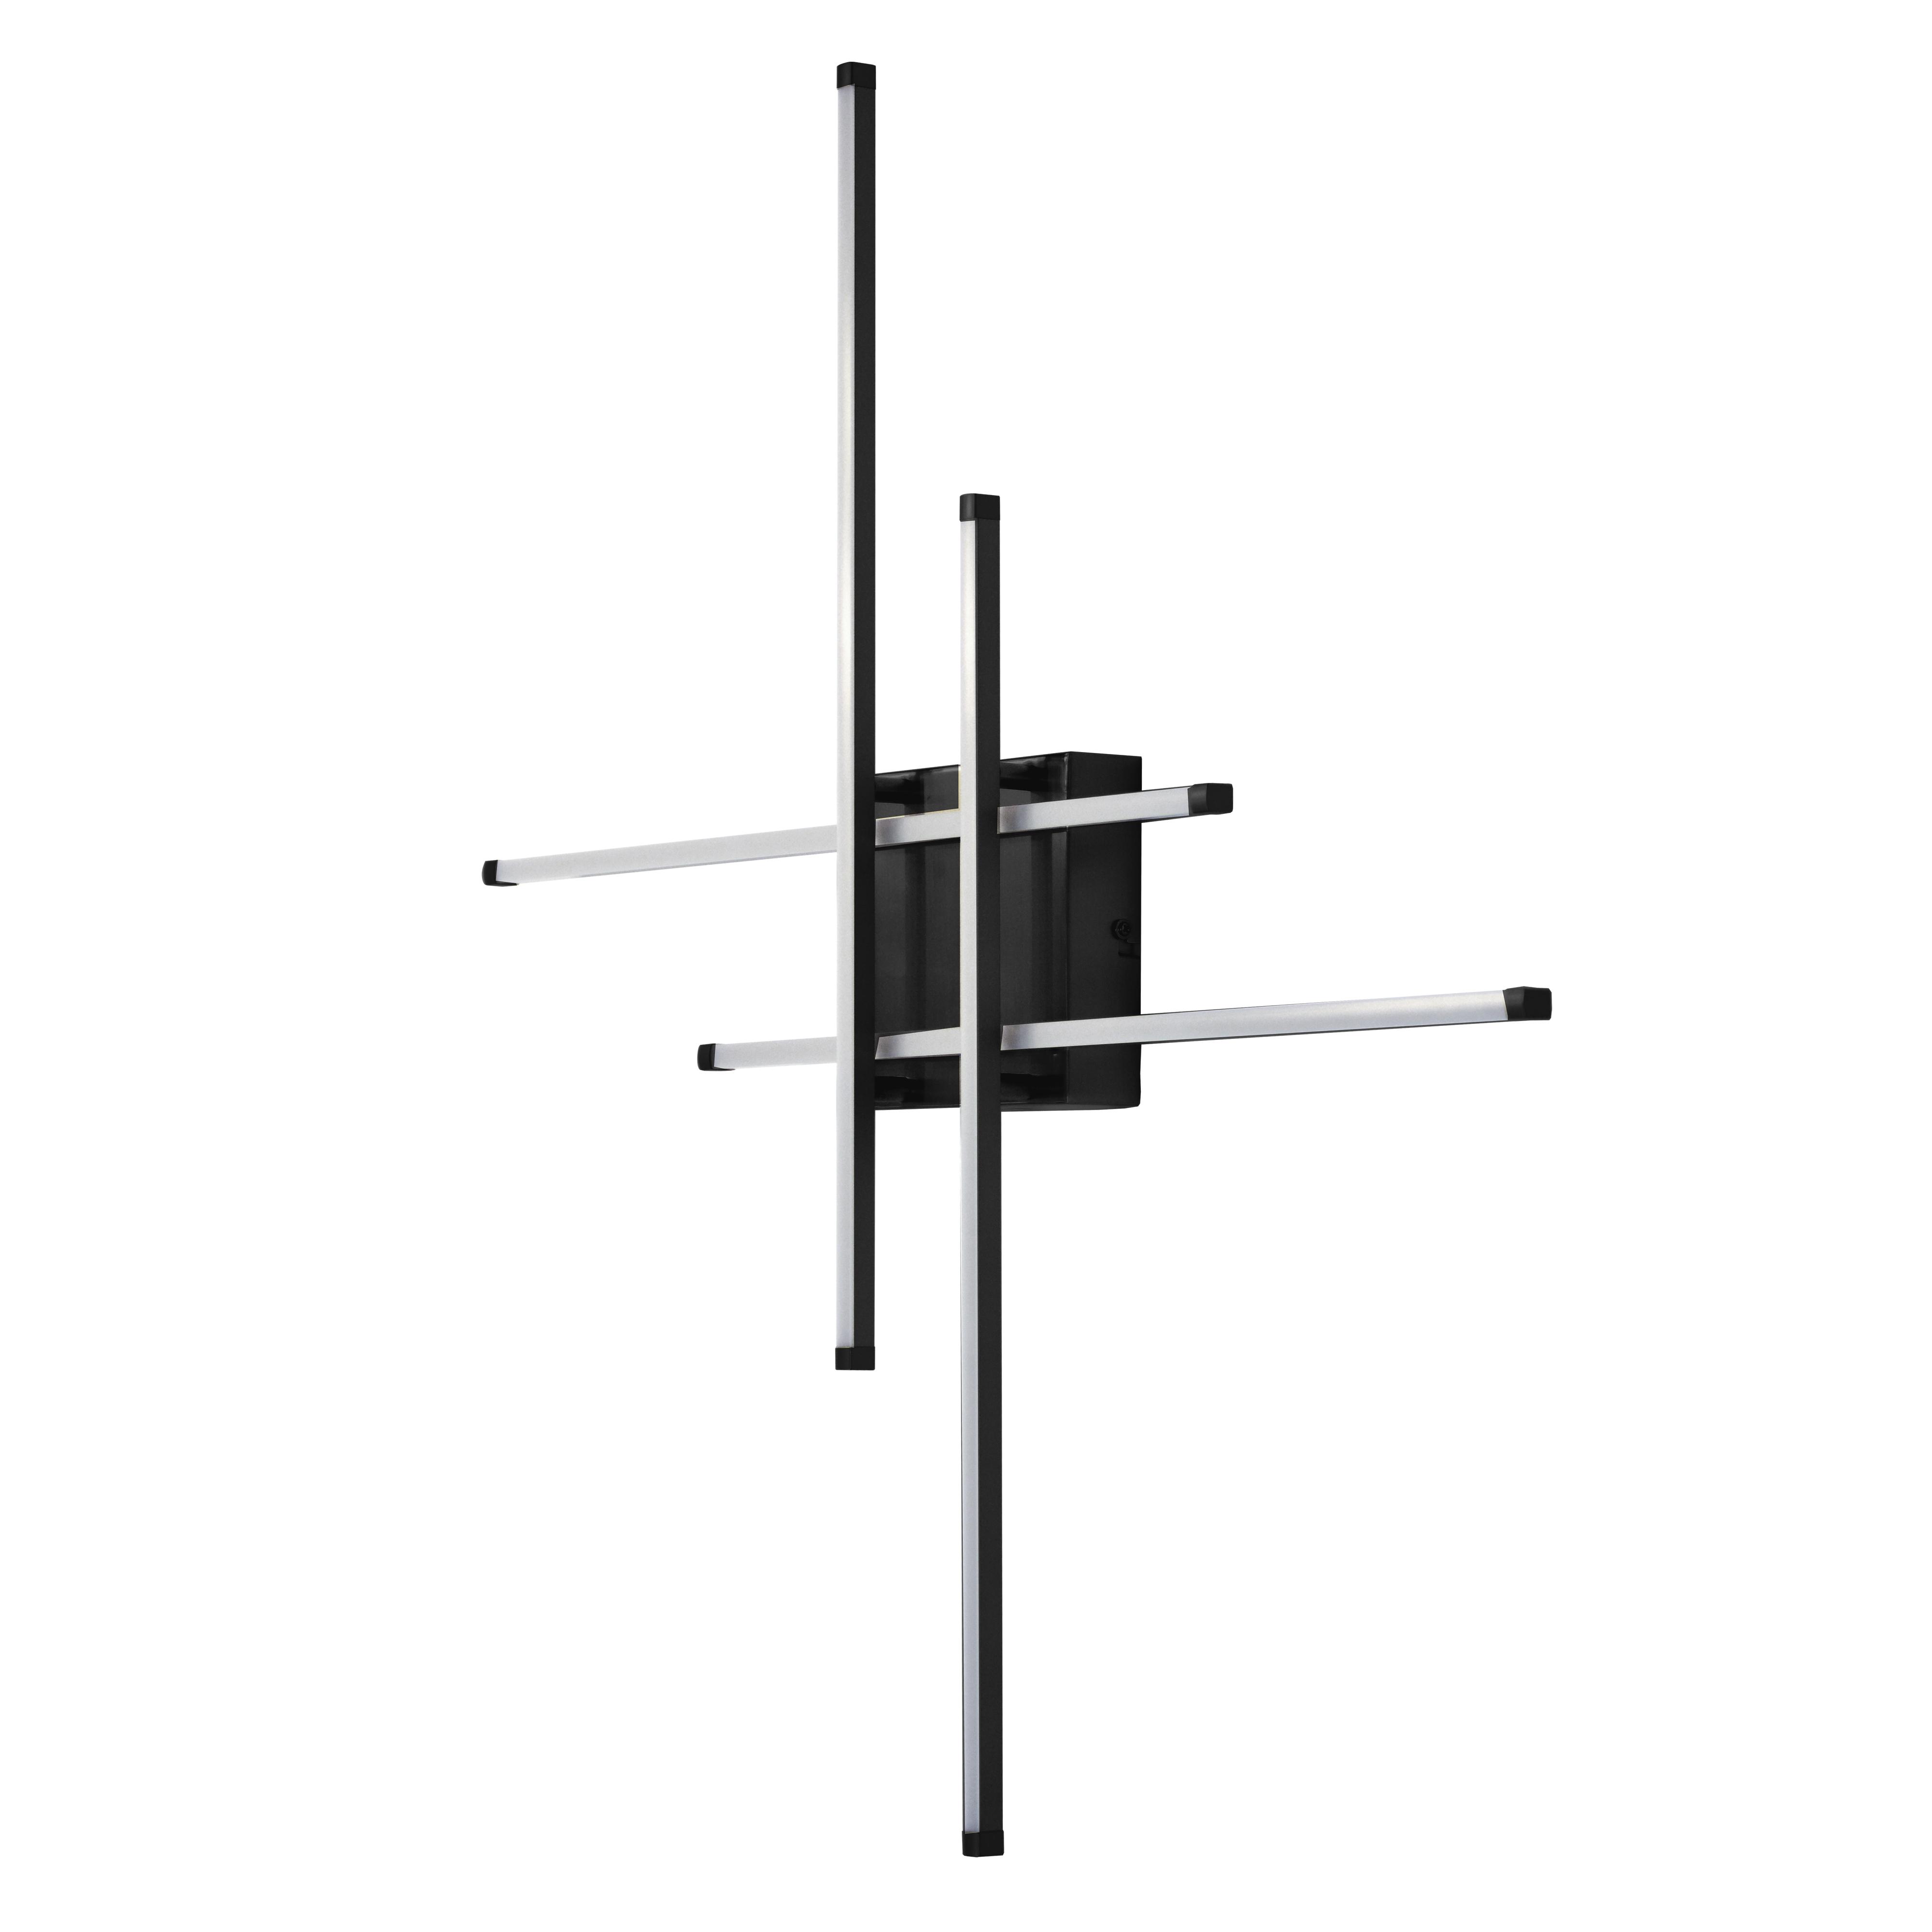 23 Watt LED Flushmount Matte Black w/White Acrylic Diffuser